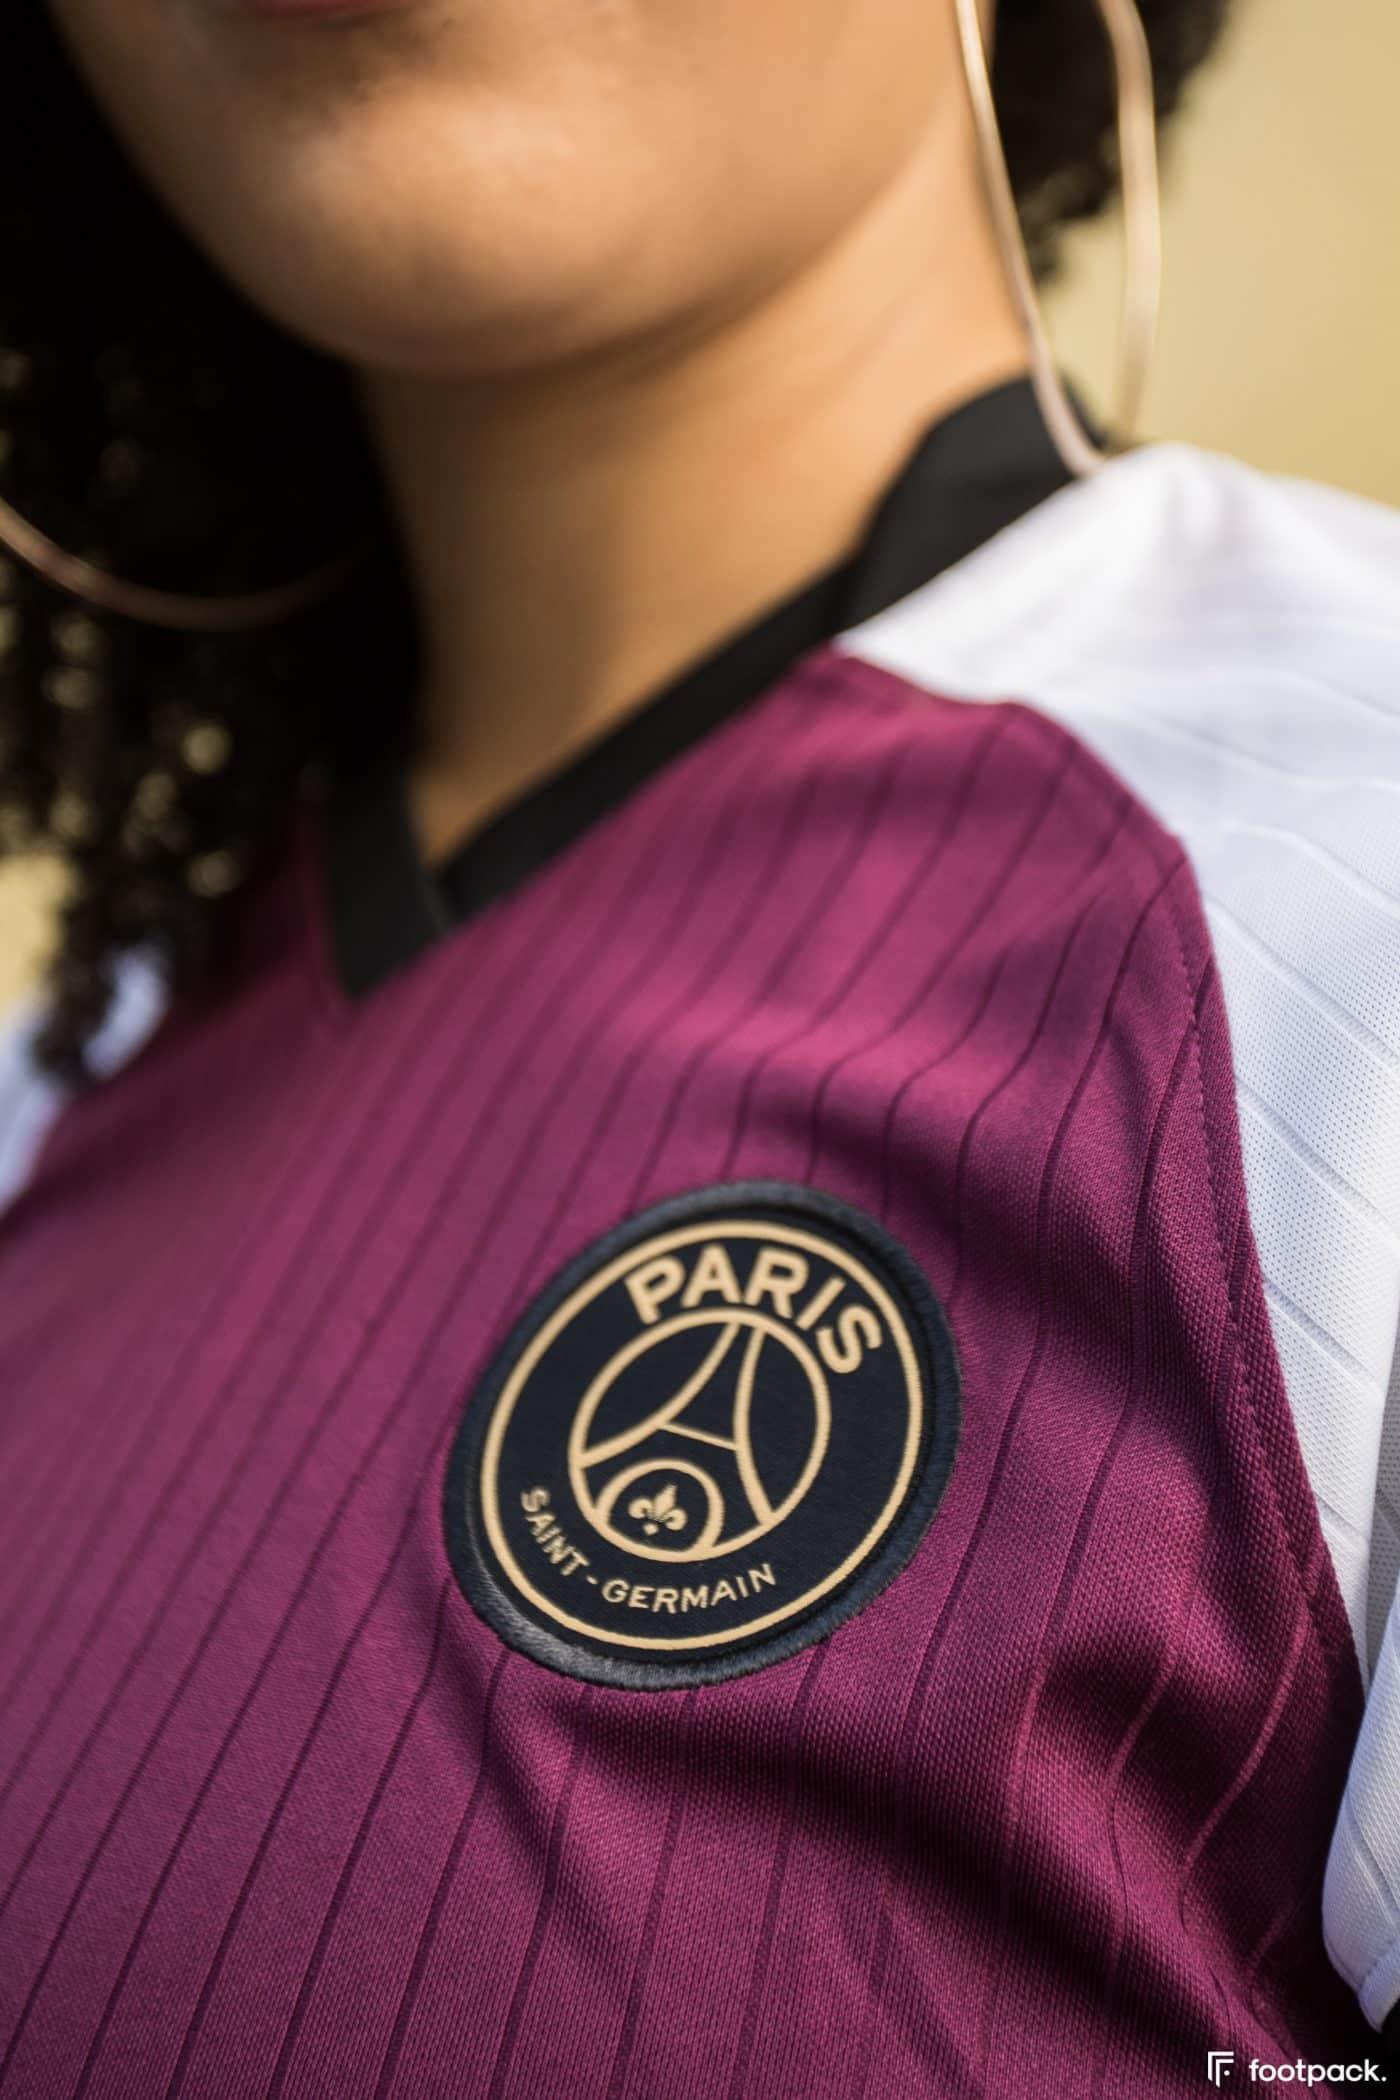 maillot-psg-jordan-2020-2021-footpack-20